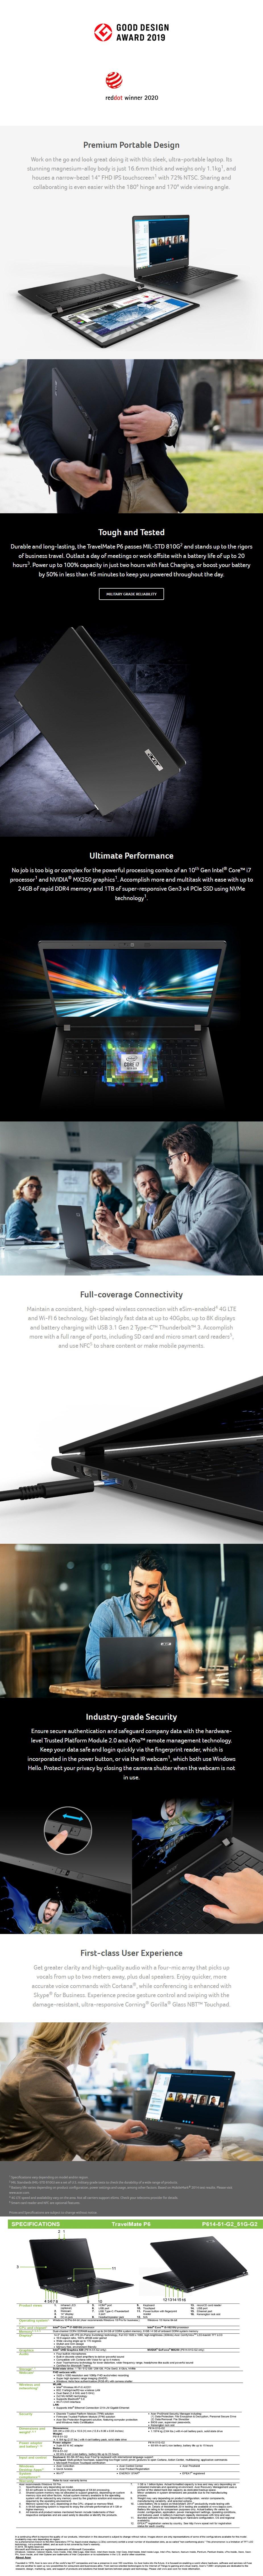 acer-travelmate-p614-14-laptop-i510210u-16gb-256gb-win10-pro-touch-ac41269-10-1-.jpg